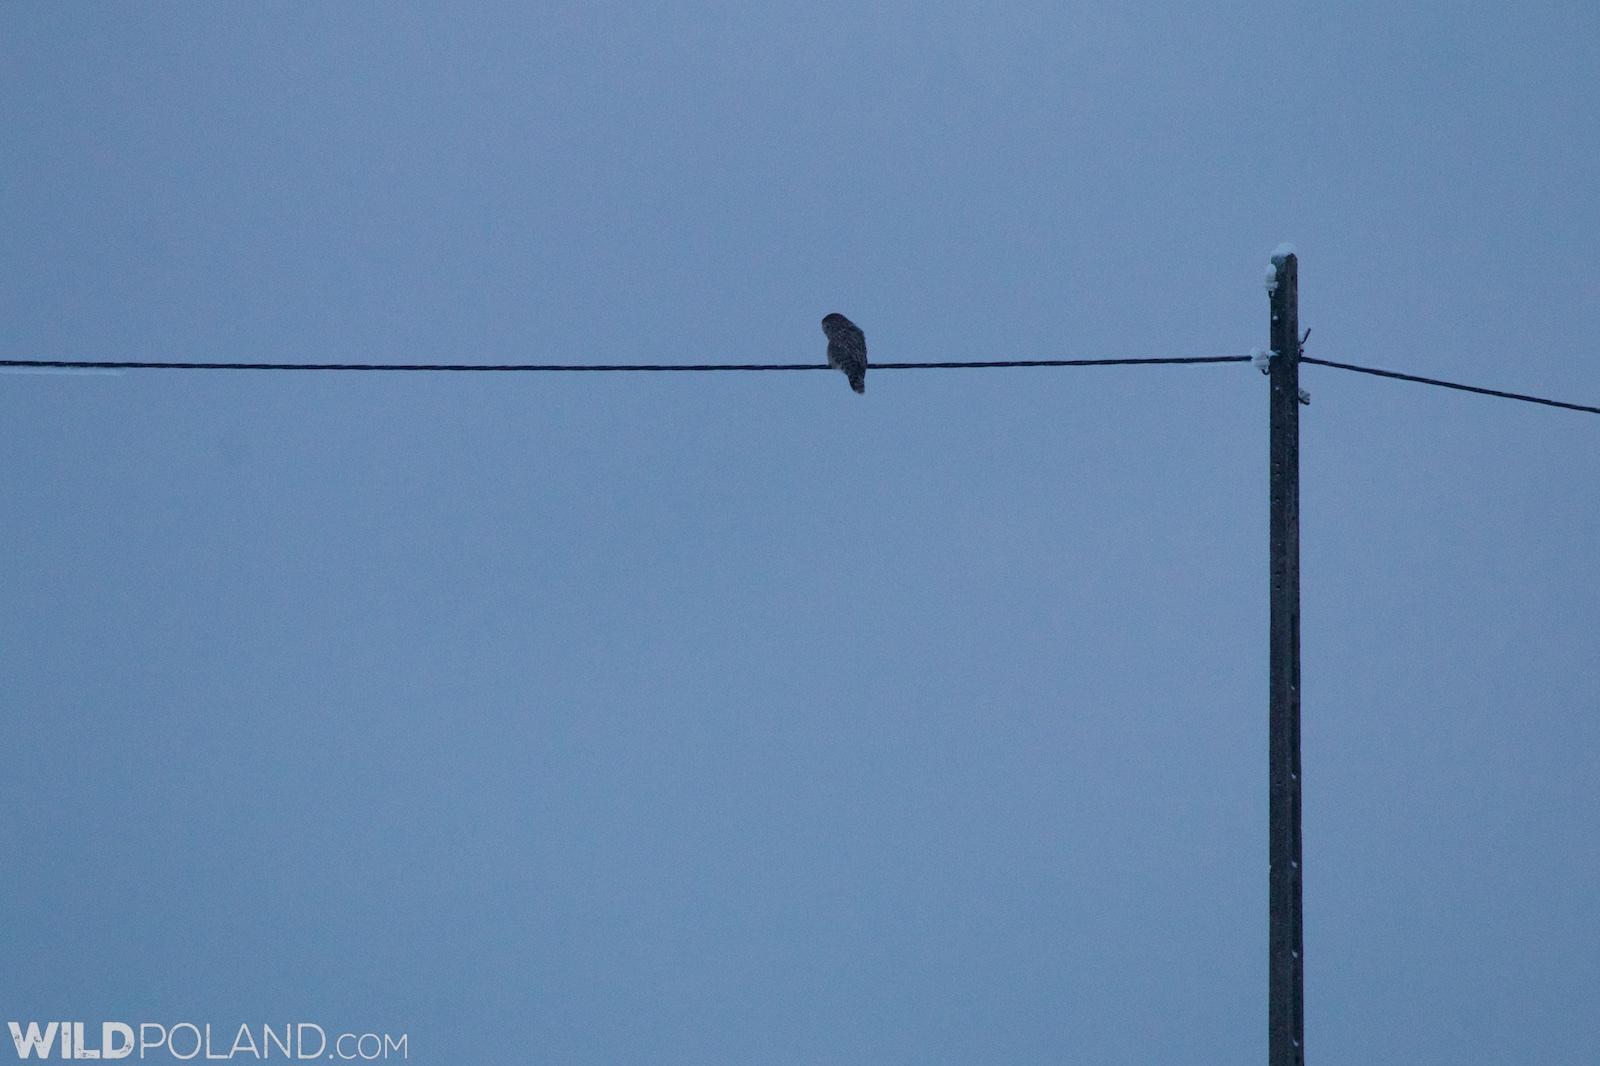 Ural Owl hunting at daybreak, Eastern Carpathians. We saw it getting a vole!